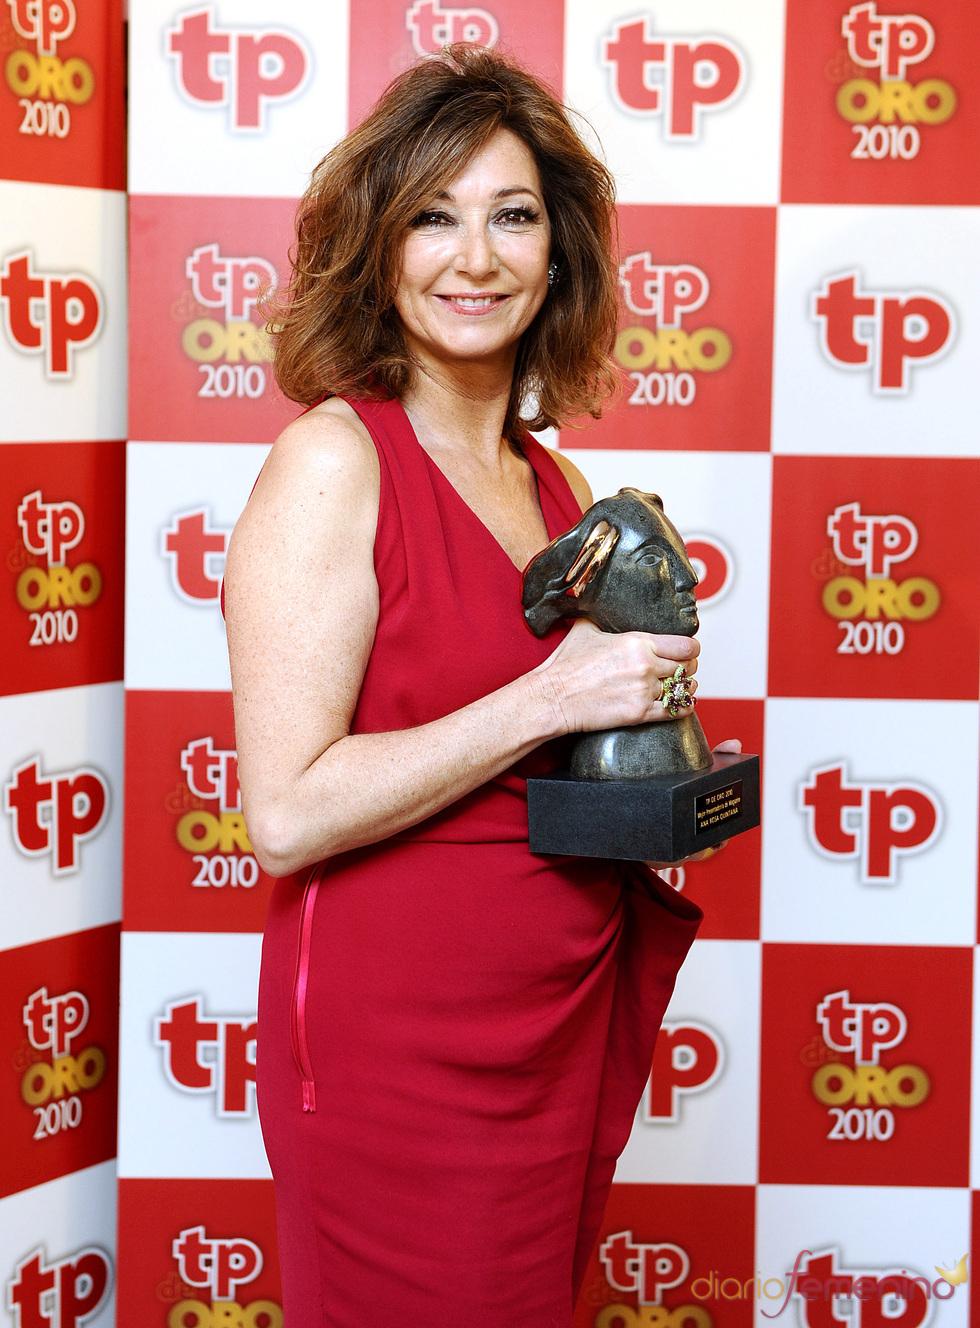 Ana Rosa Quintana, Premio TP de Oro 2010 como 'Mejor presentadora de magazine'